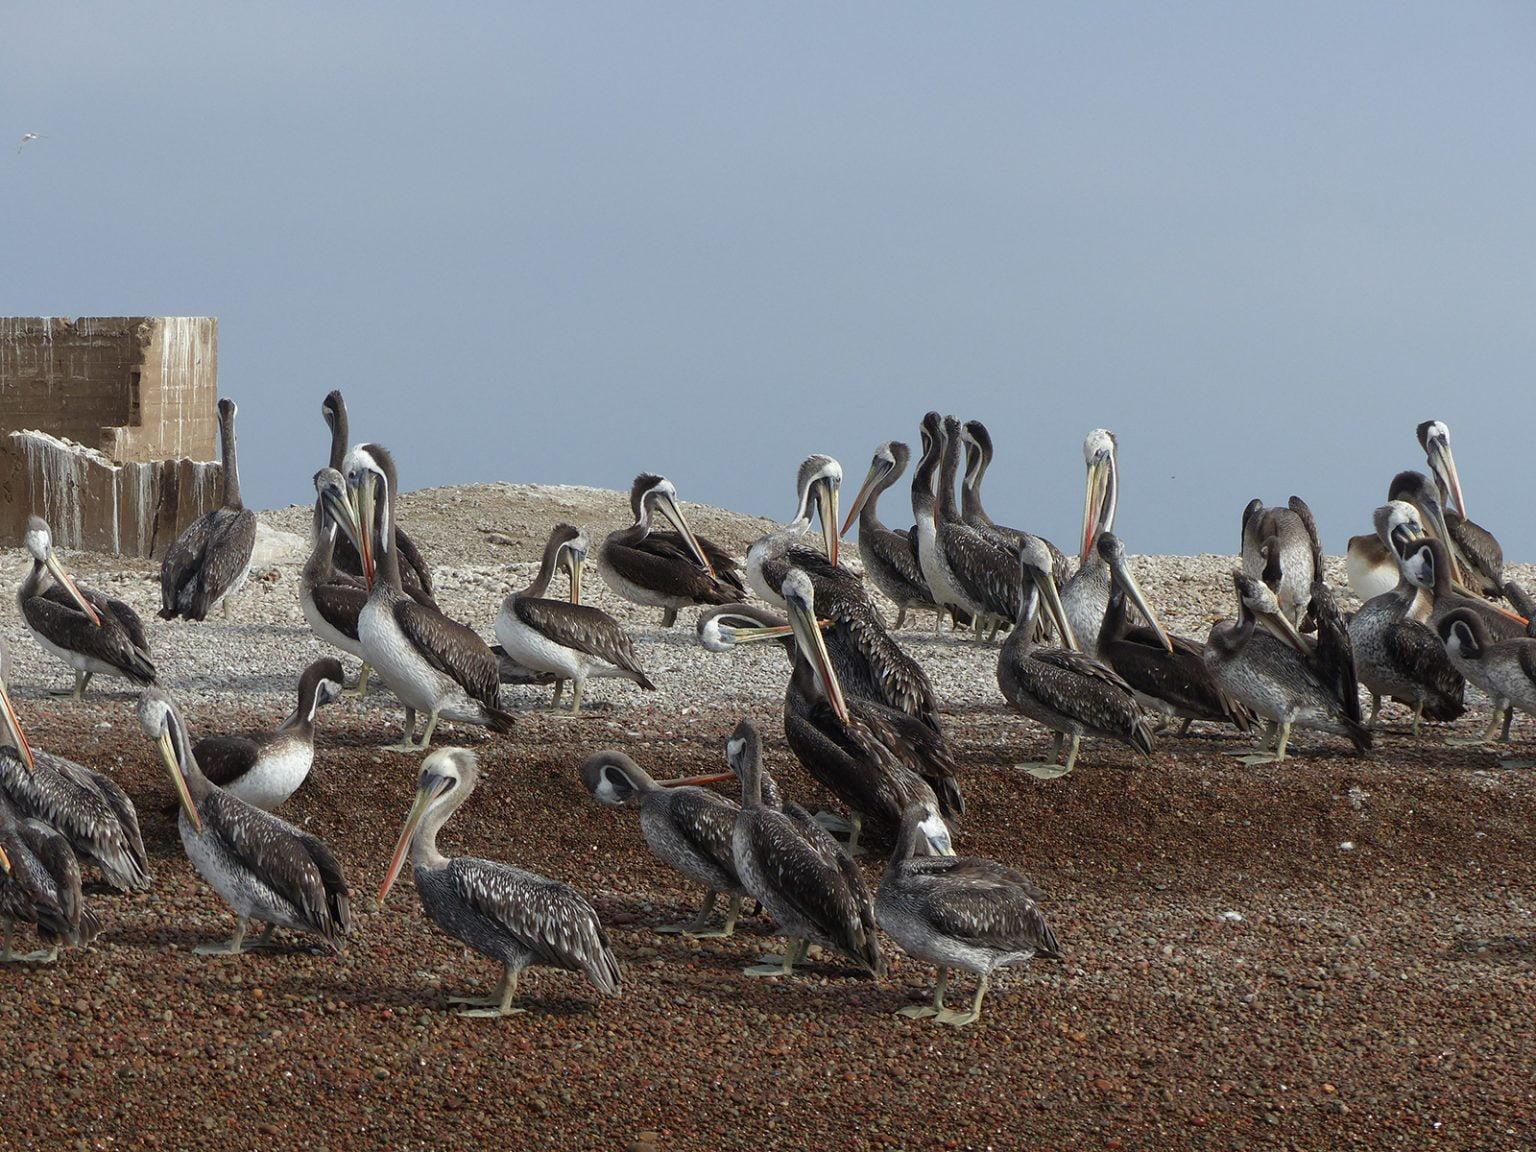 Pelicans on the beach, Baleastas Islands, Peru